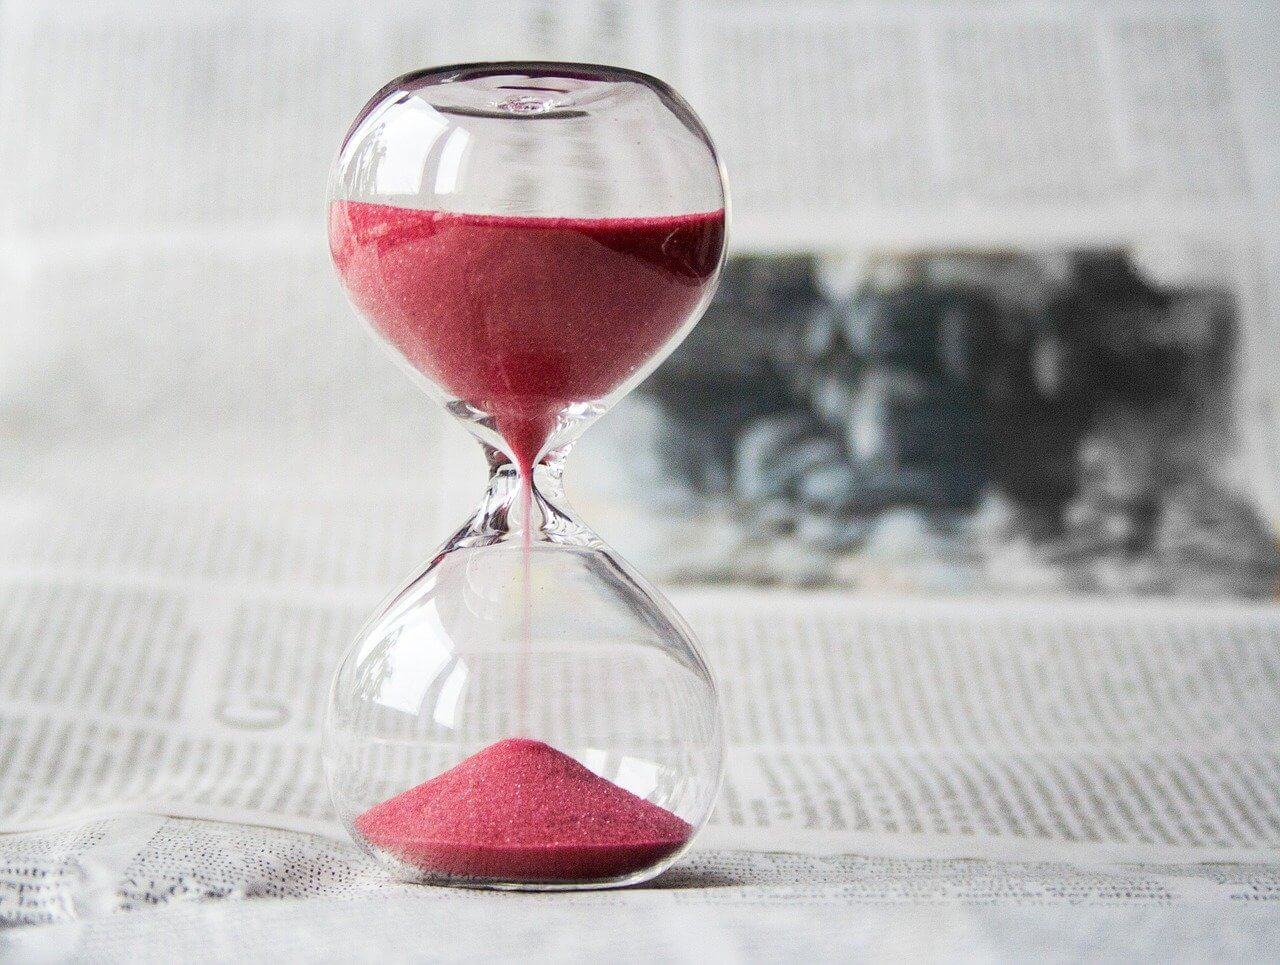 sablier temps weeprep